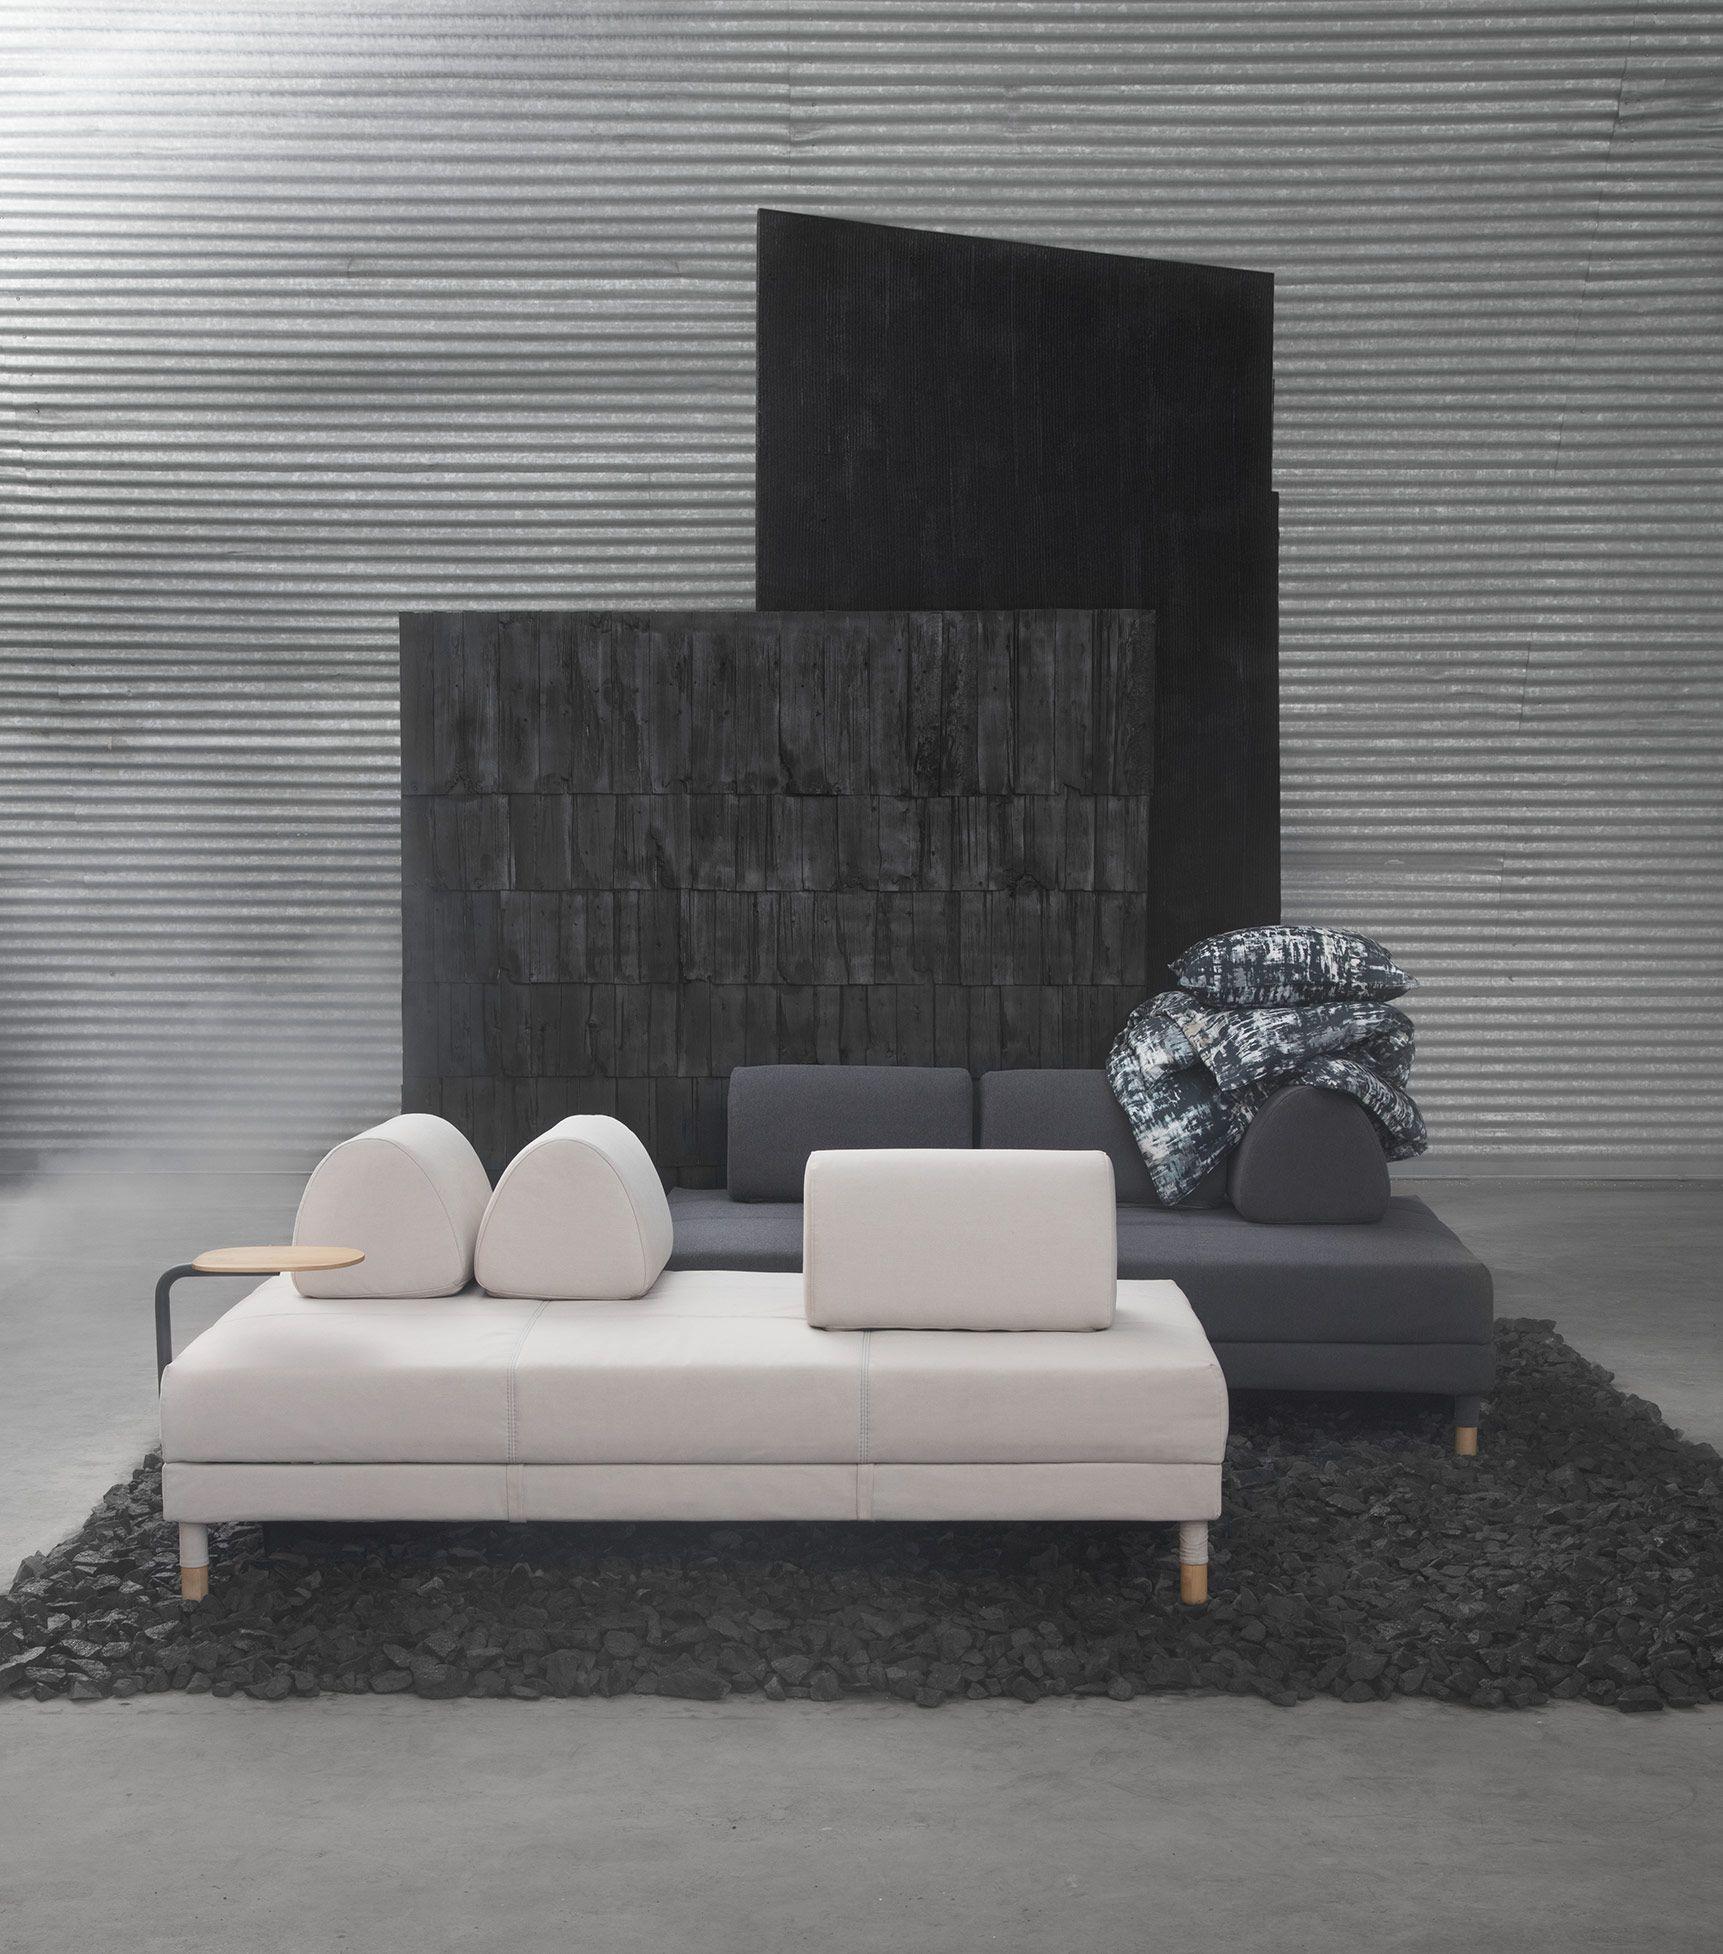 19314e46f027a0dced1b16e3fdde57b9 Luxe De Table Basse Convertible Ikea Des Idées